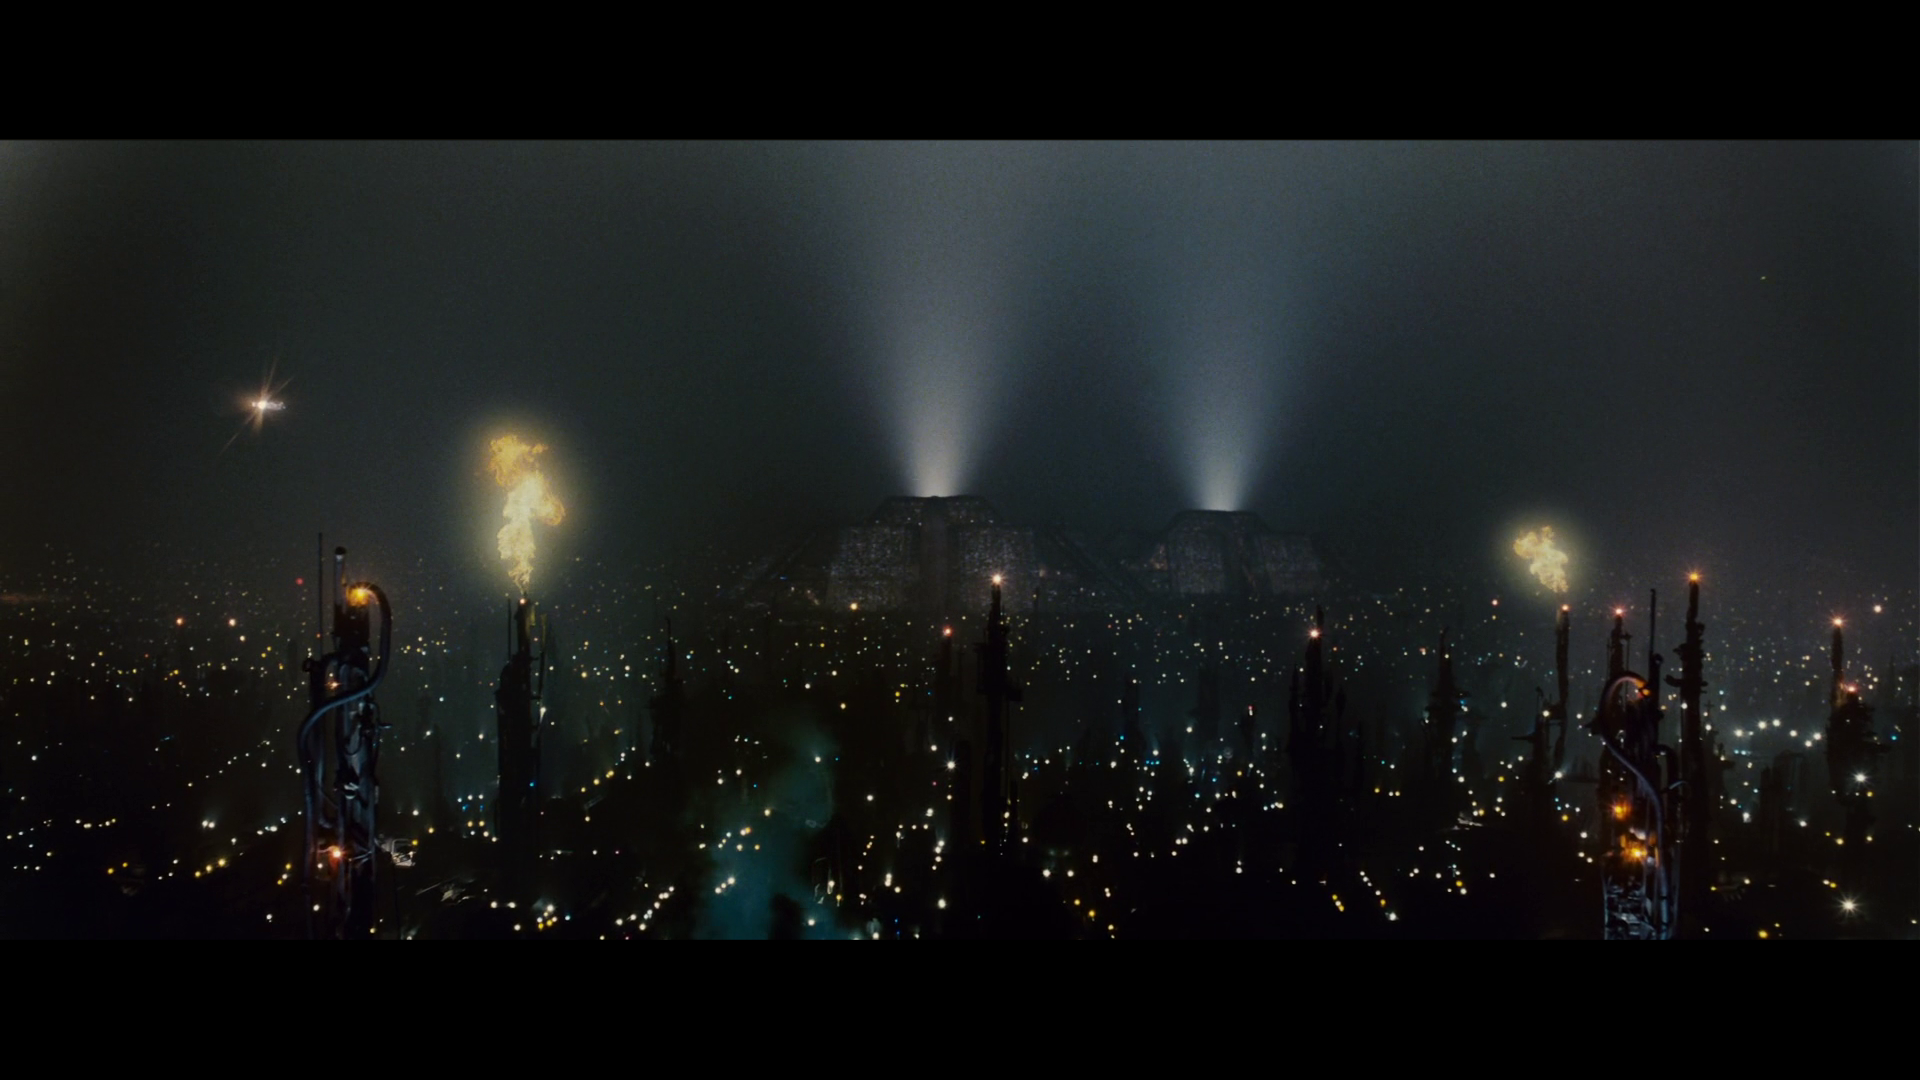 Blade Runner background 1920x1080 Cyberpunk 1920x1080